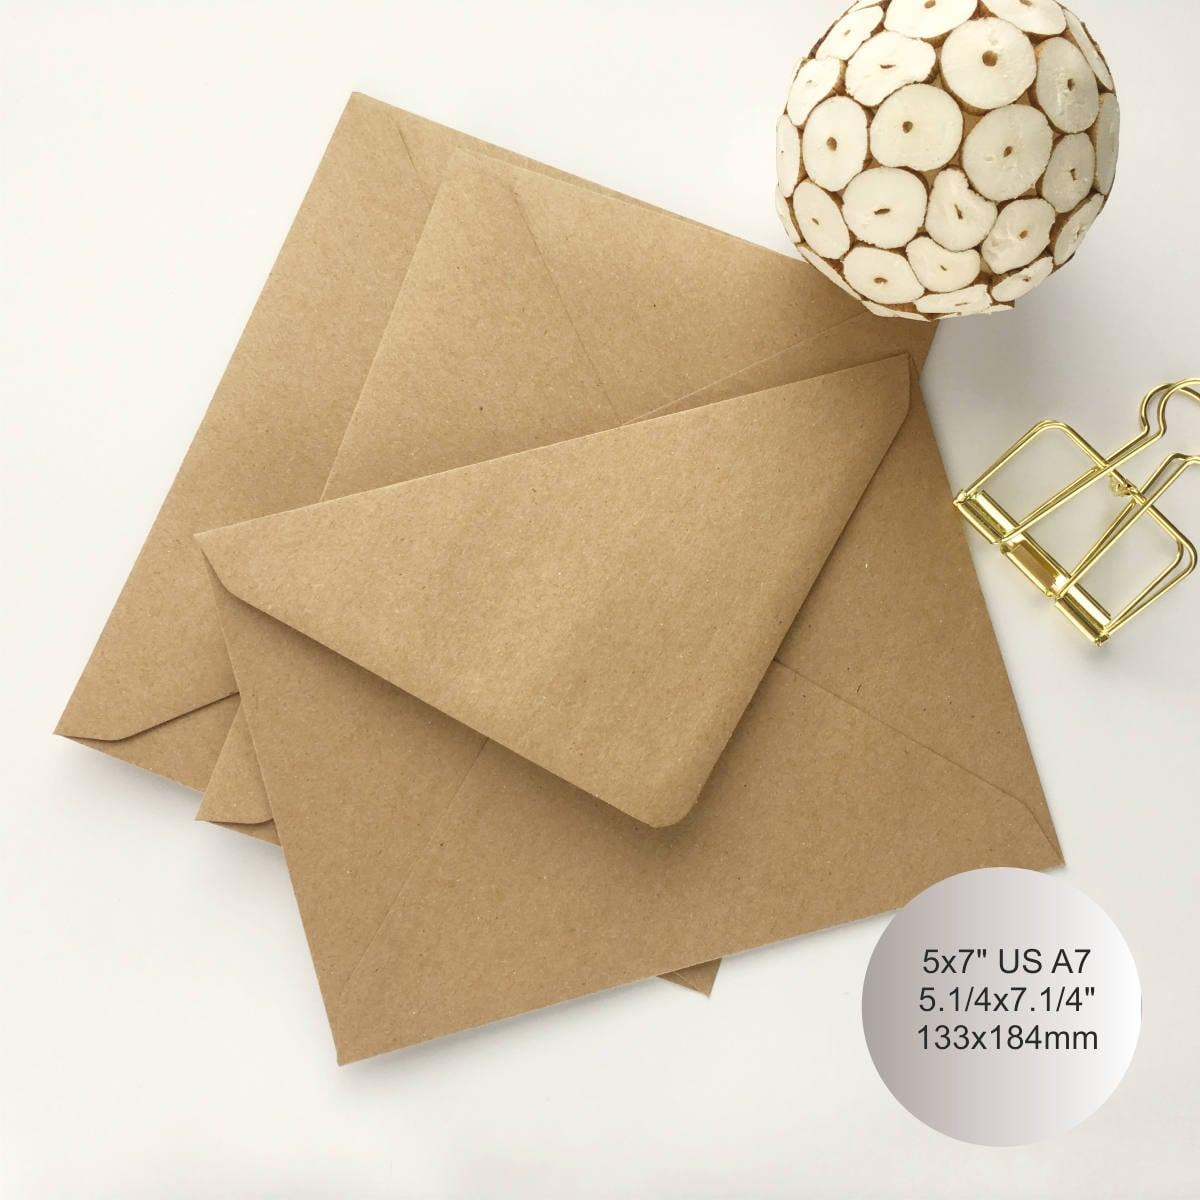 100 5x7 kraft envelopes a7 envelopes envelopes bulk rustic envelopes 2195 kristyandbryce Choice Image